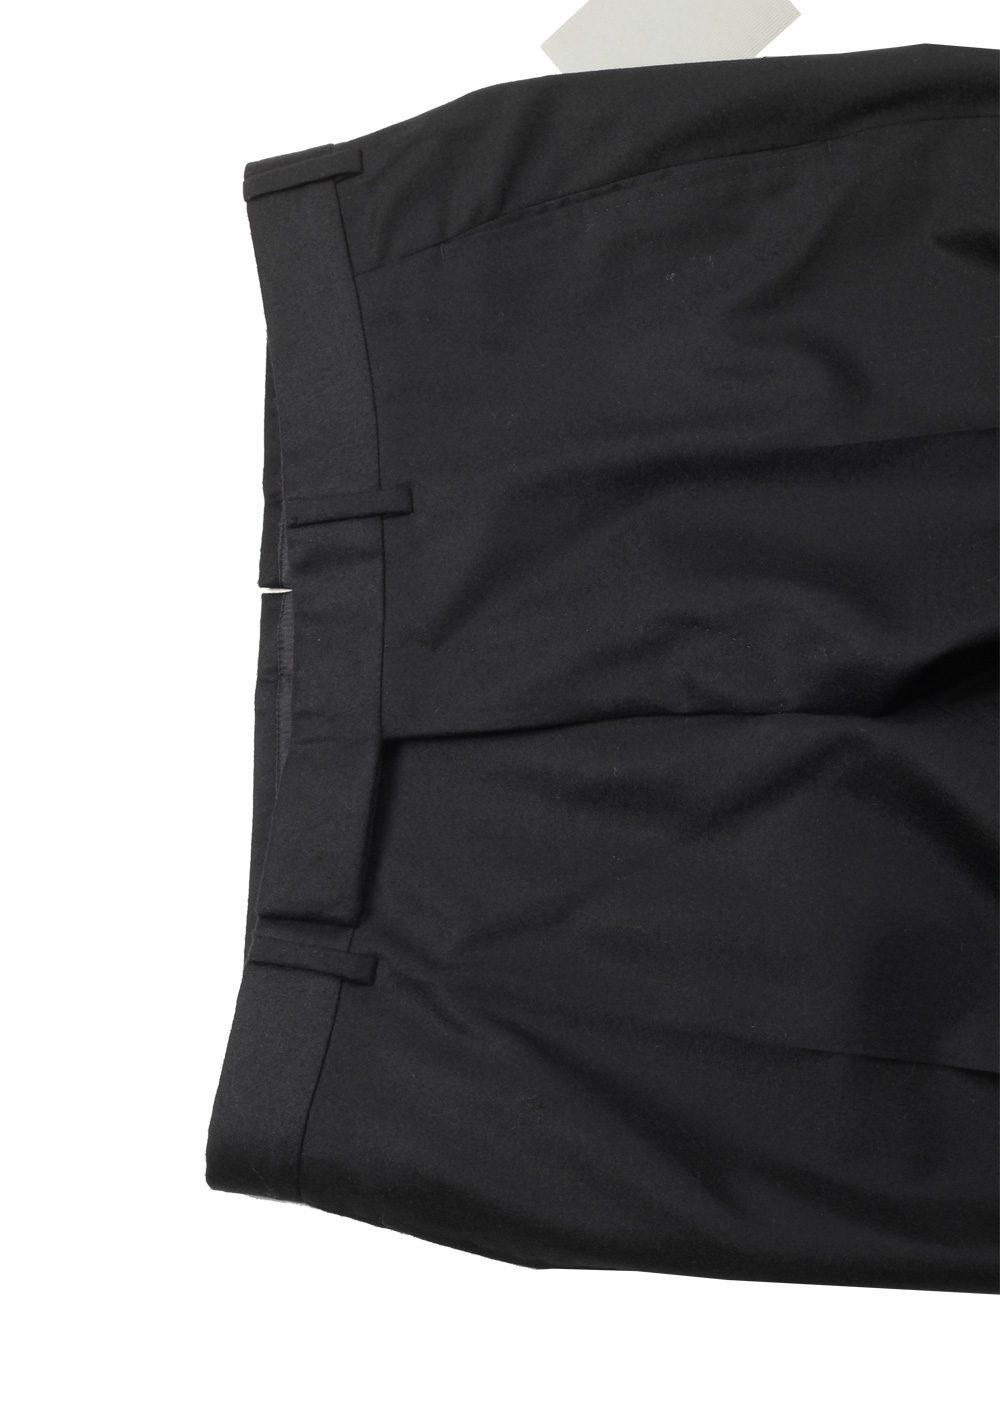 TOM FORD Black Wool Cashmere Dress Trousers Size 52 / 36 U.S. | Costume Limité